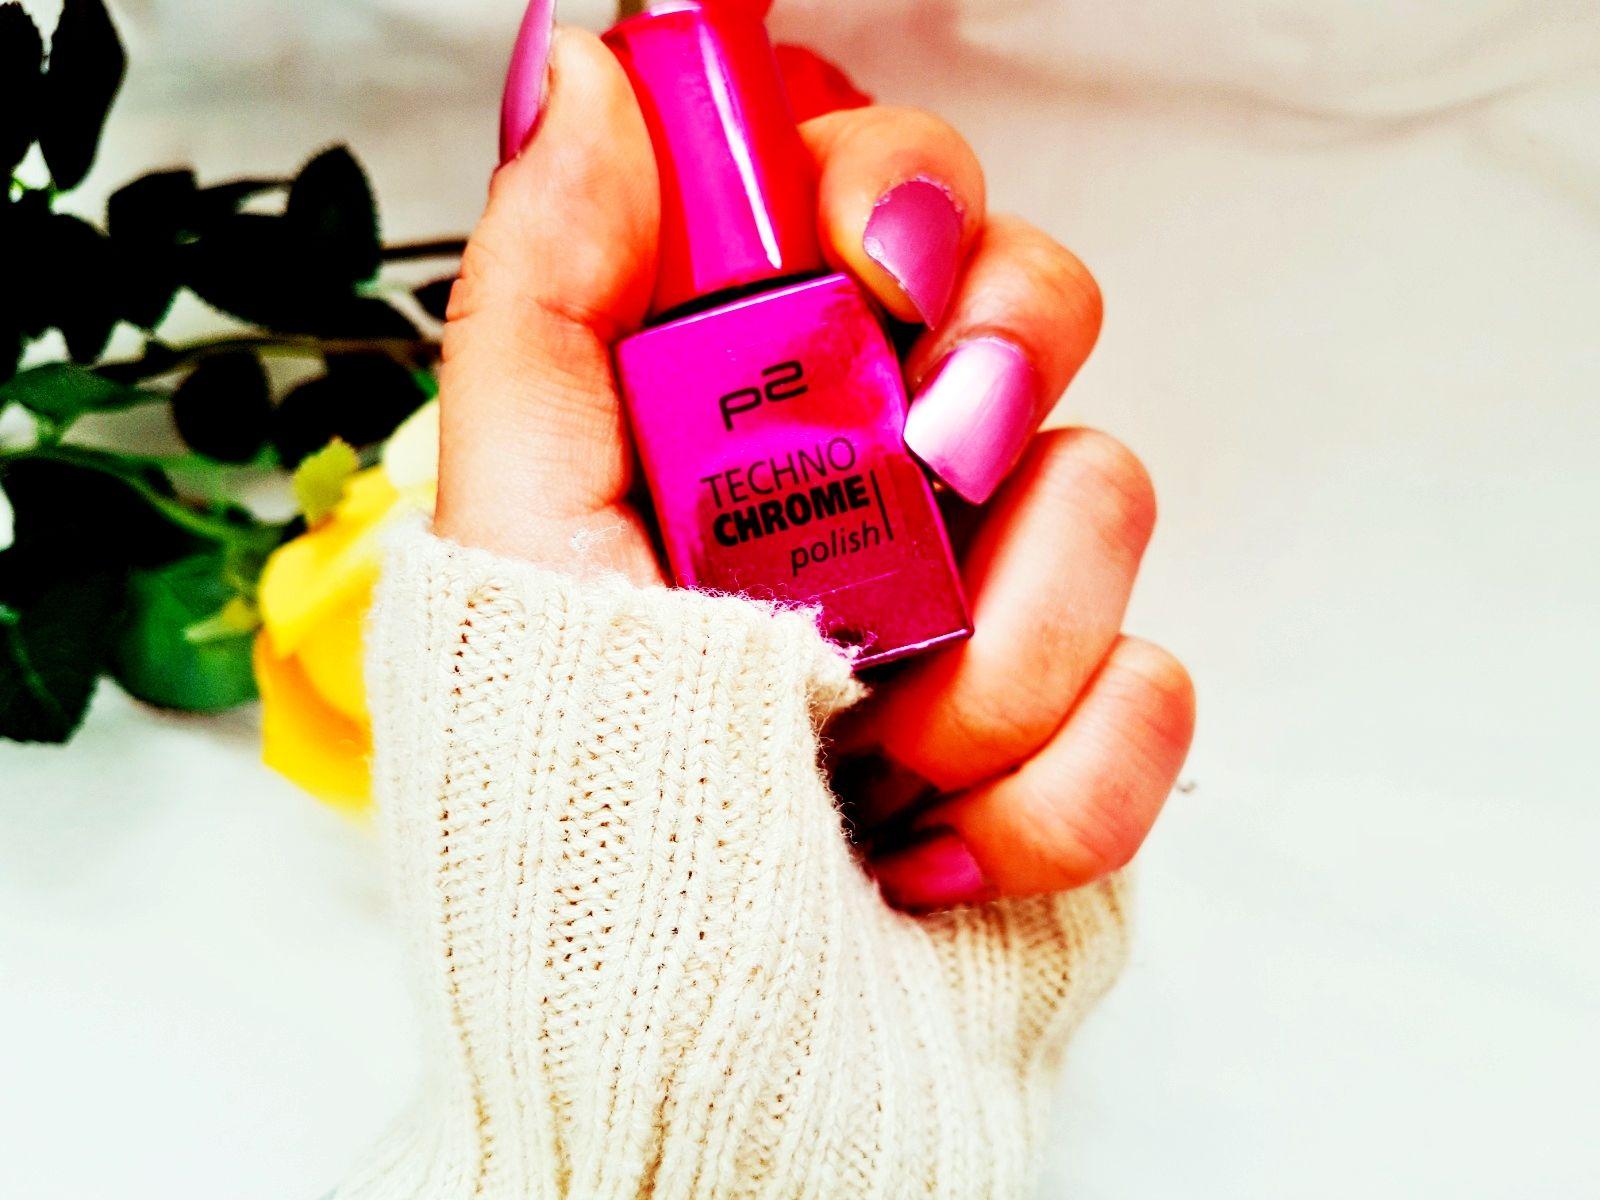 P2 cosmetics Nagellack  Techno Chrome Polish pink spark Erfahrung